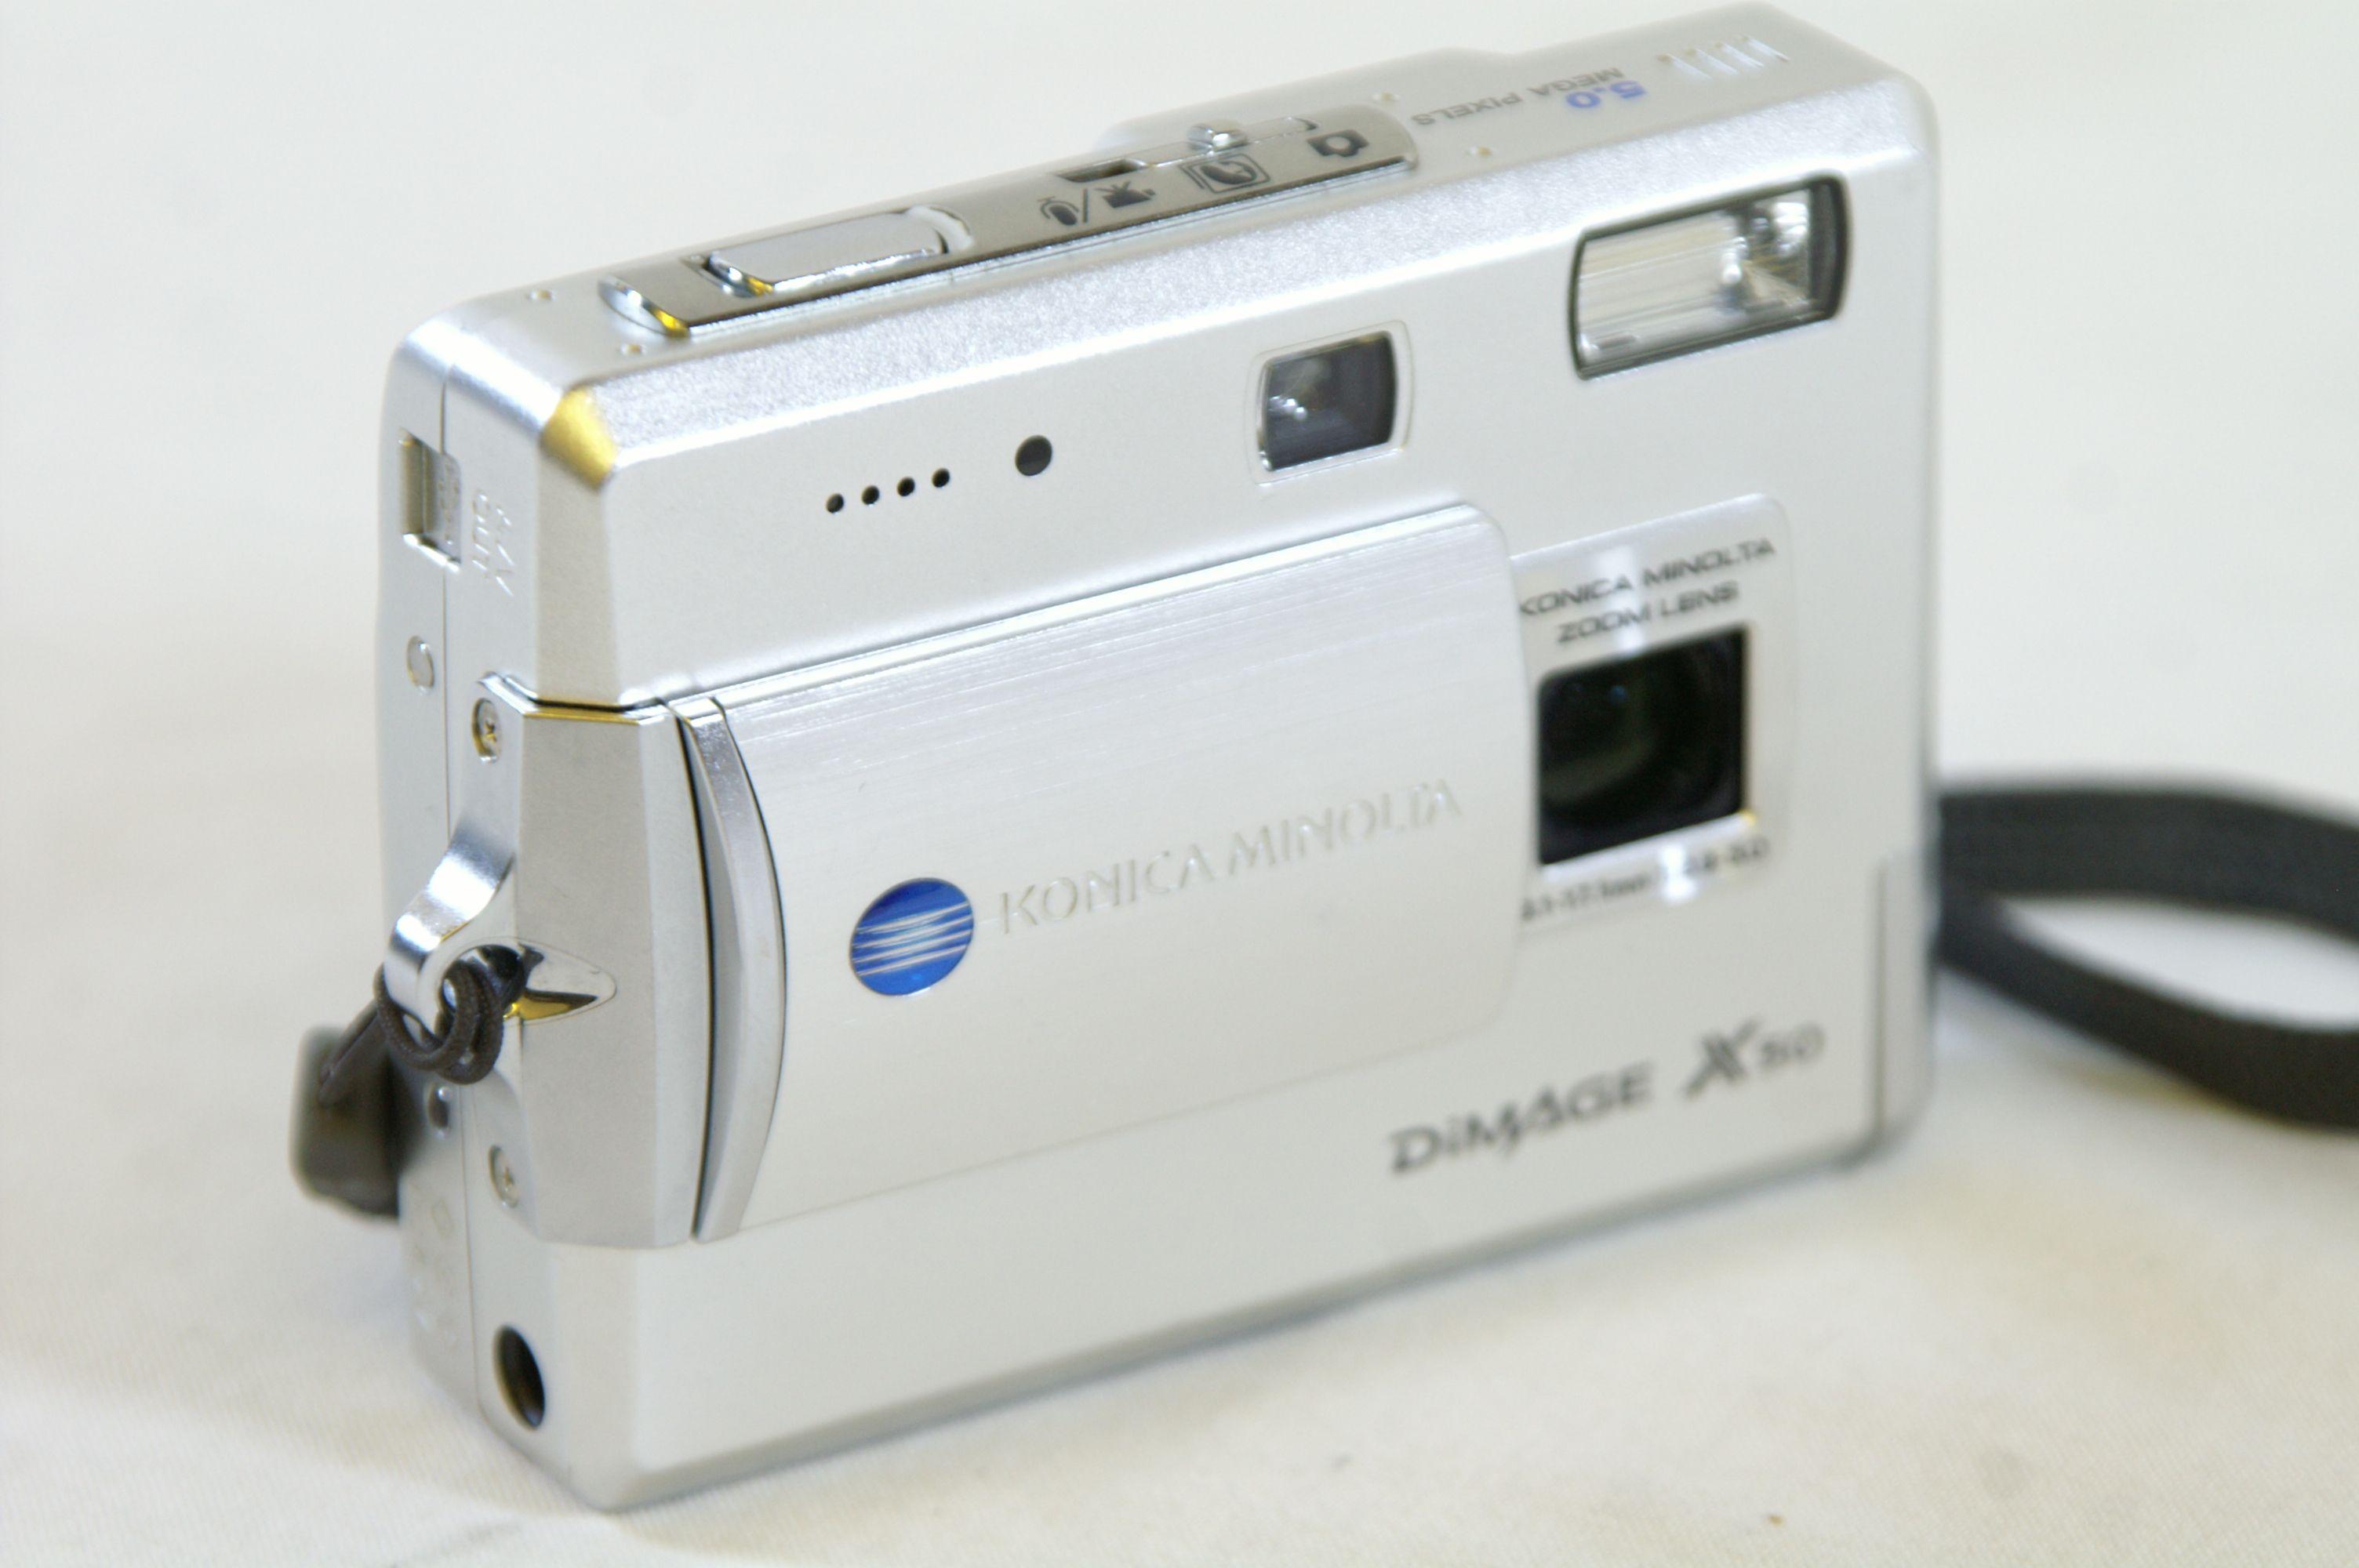 Konica Minolta Dimage X50 5.0MP Digital Camera with SD Card Bundle 3. Open  Full-Size Image